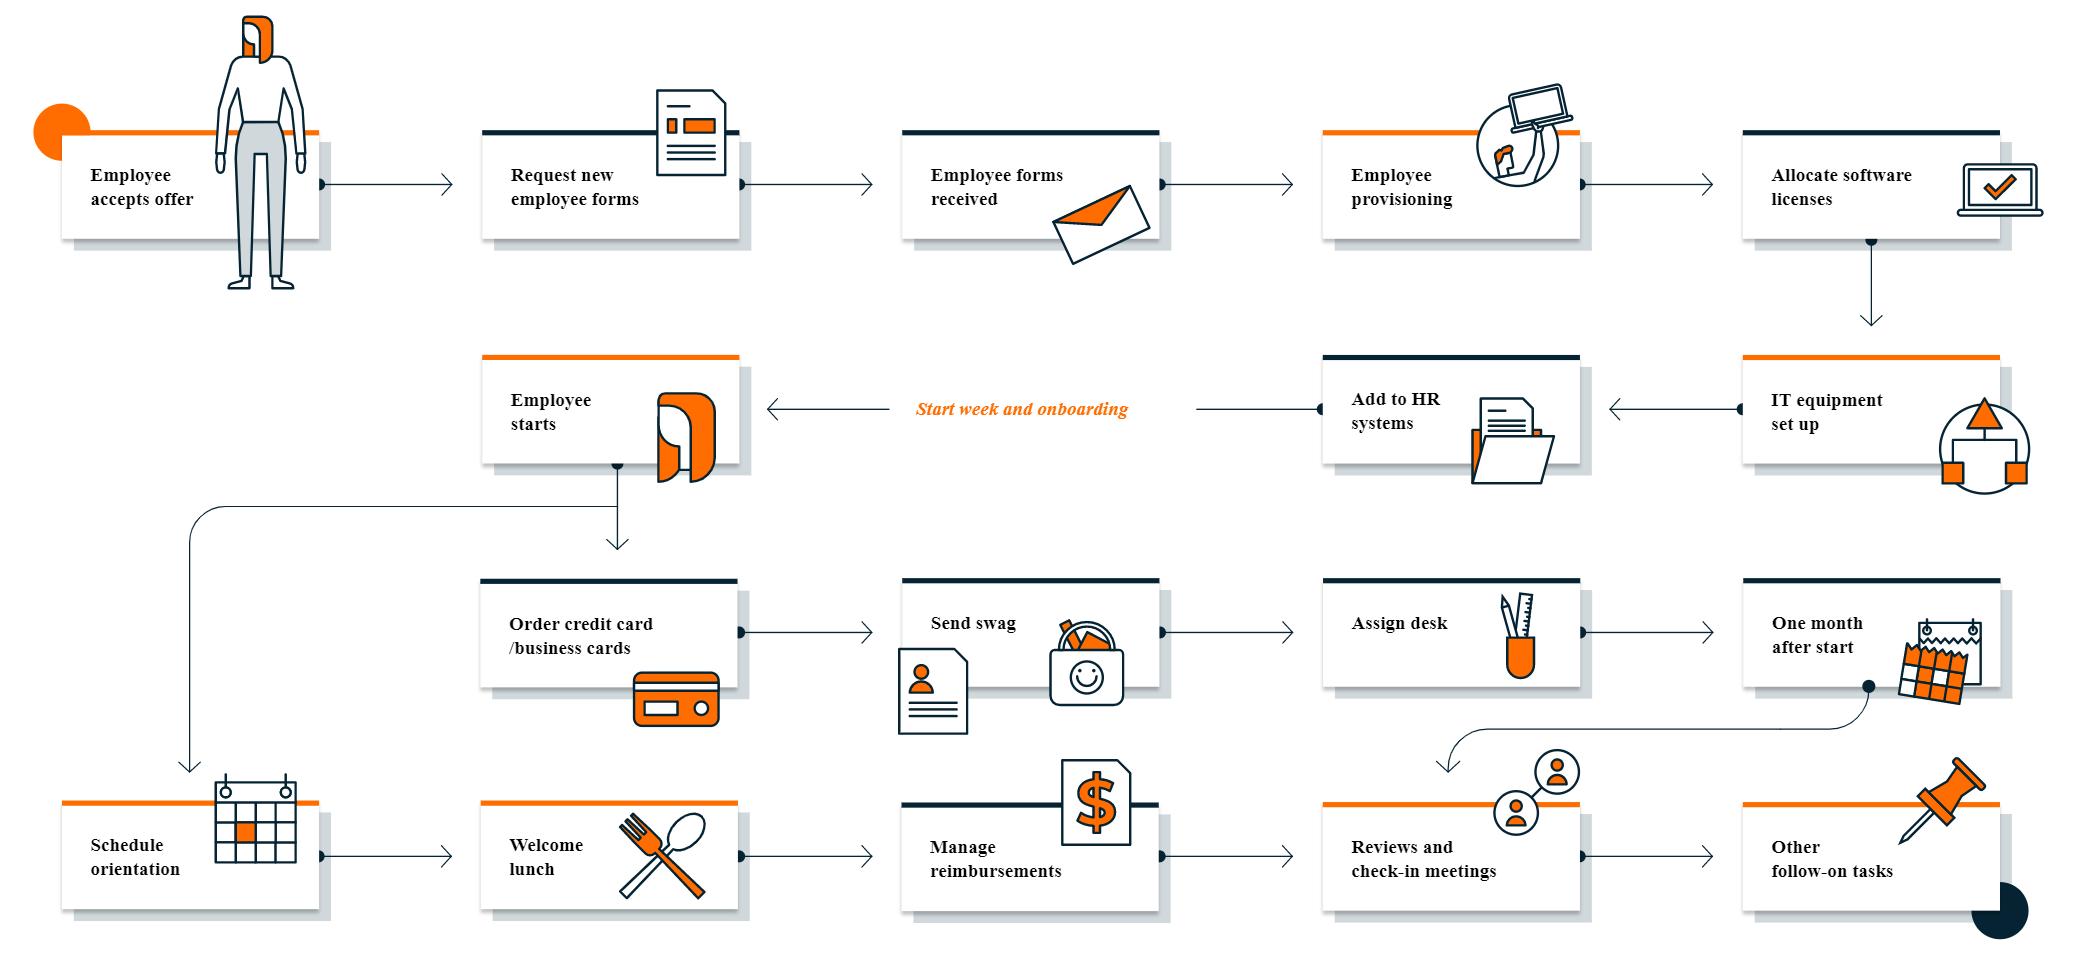 Nintex_Employee_Onboarding_Workflow